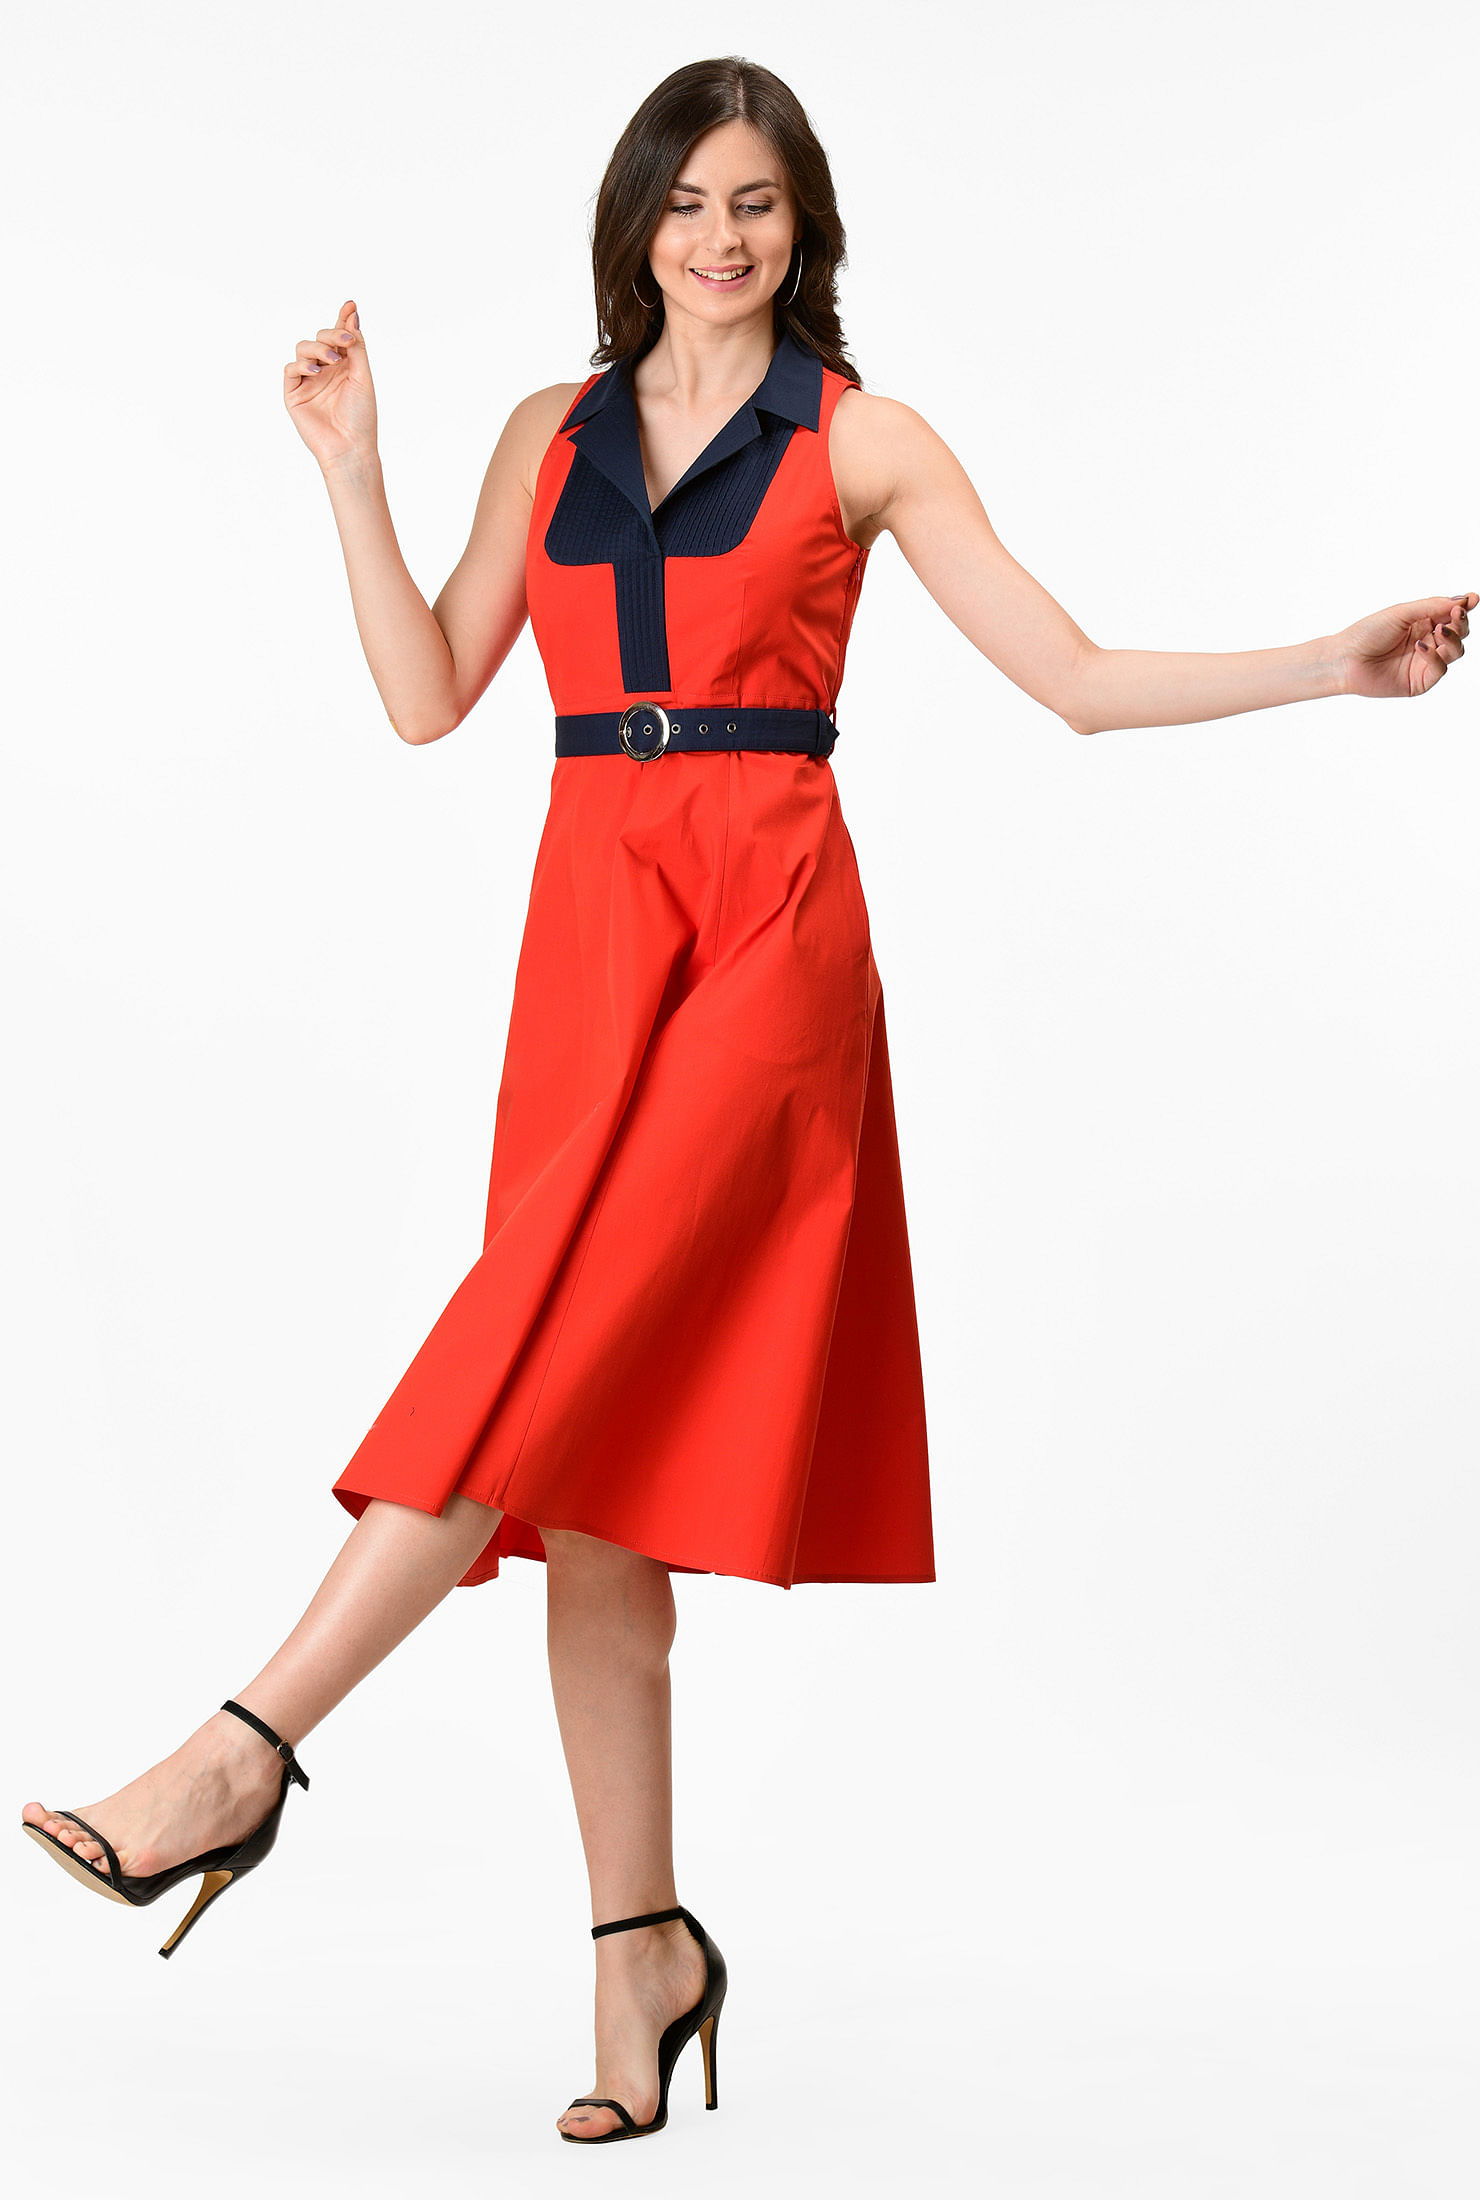 630b7d2e7ae All size inclusive, casual events, custom size, custom style, petites,